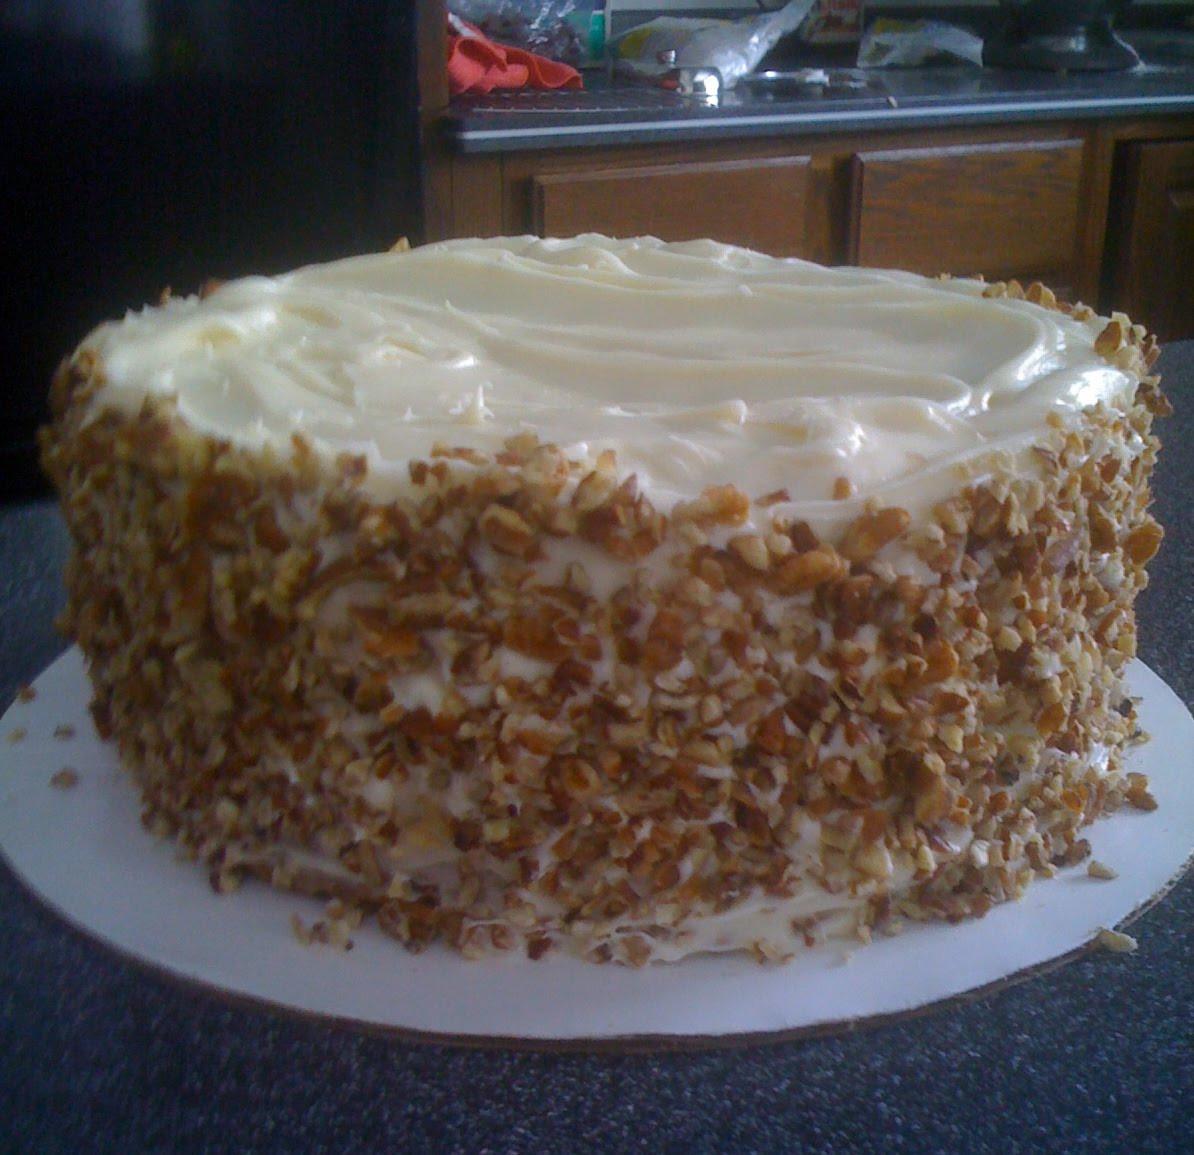 Italian Wedding Cakes  Lxathena Creations Italian Wedding Cake for Mom s Birthday